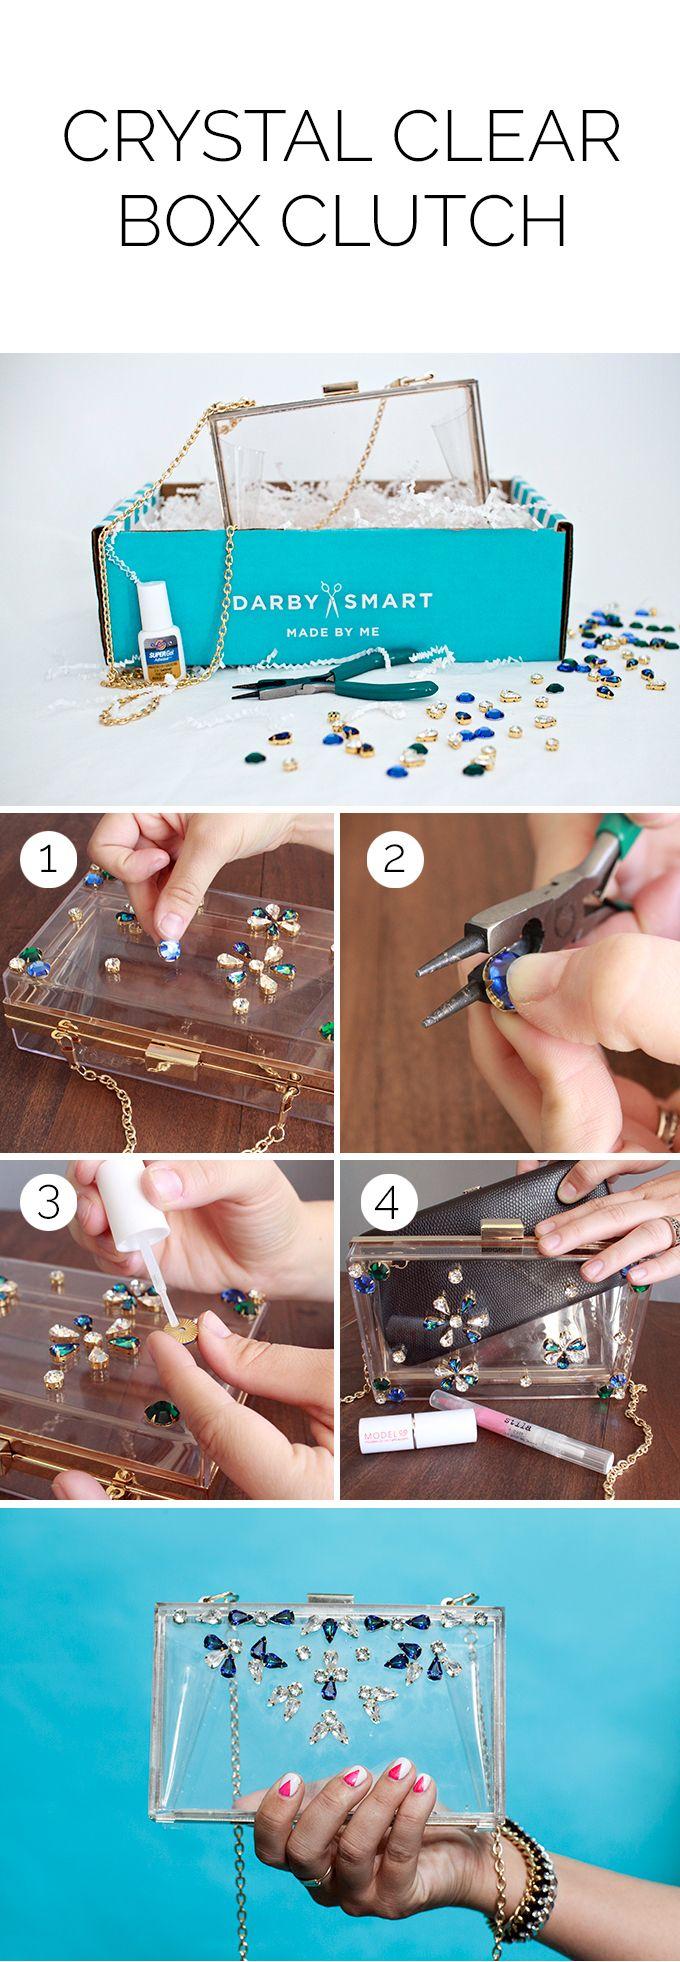 Swarovski Embellished Box Clutch   Great Holiday Gift by Darby Smart